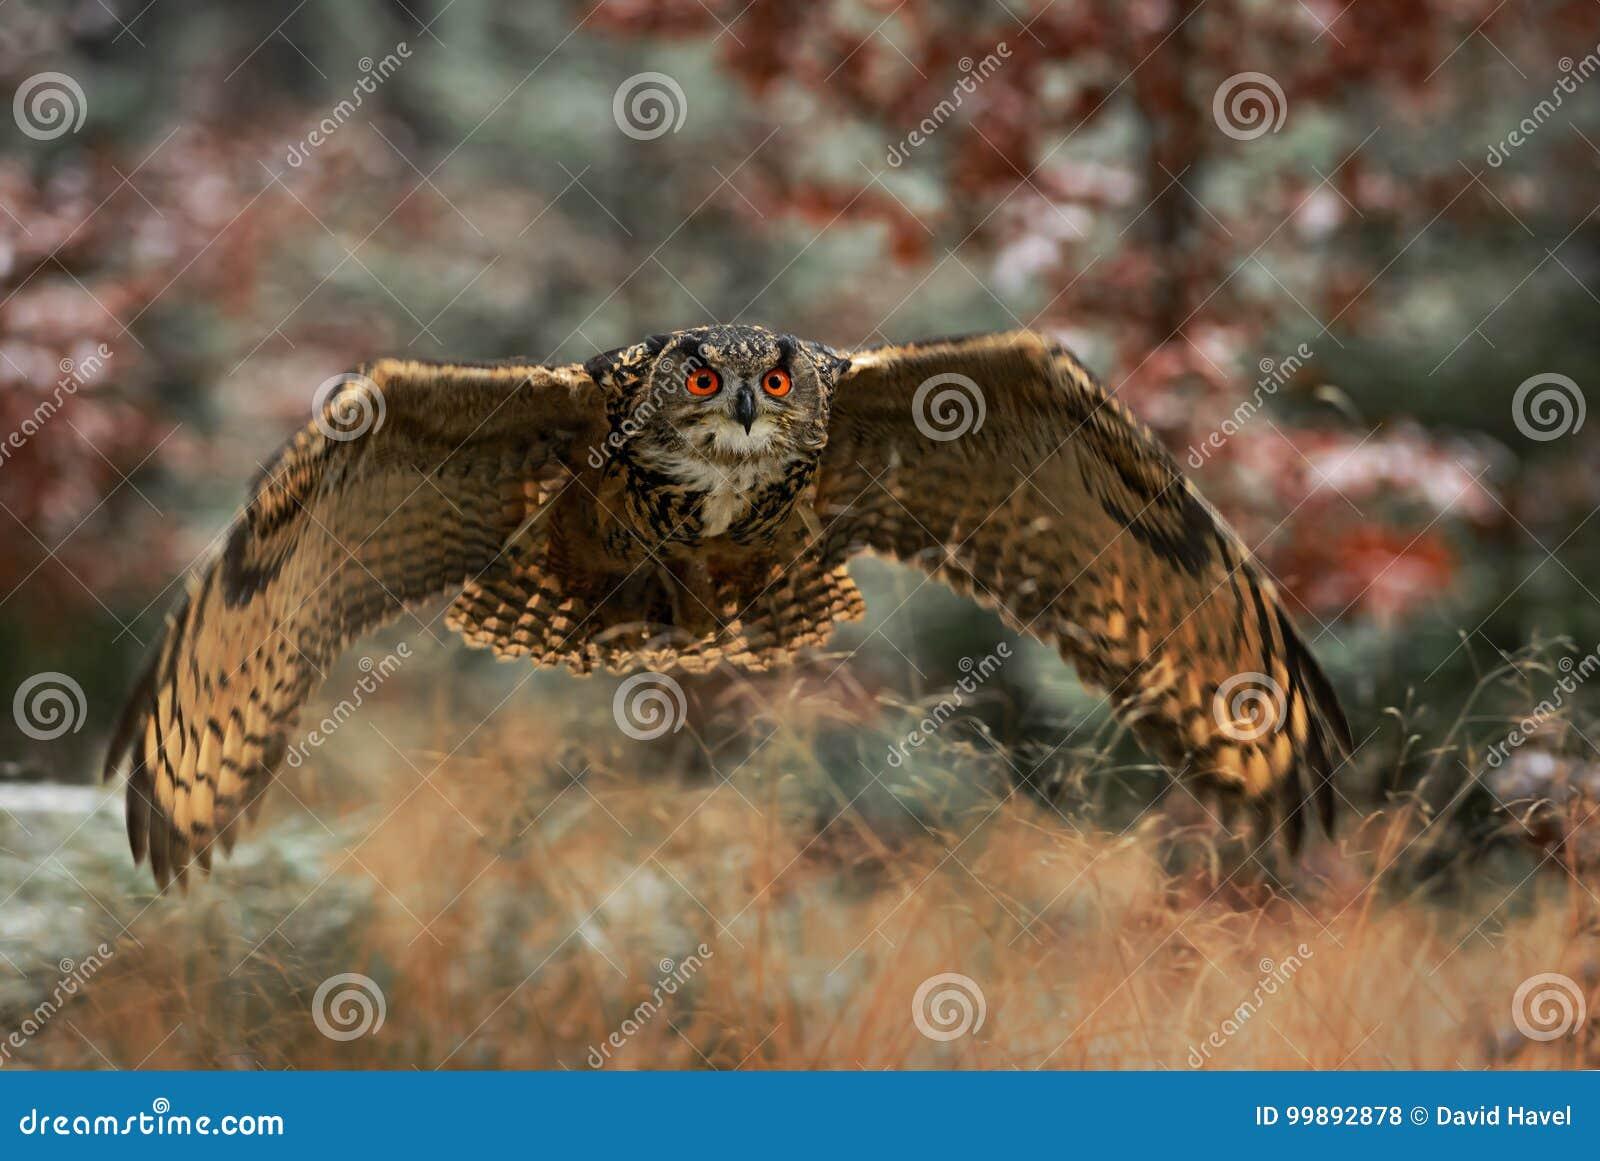 Eagle-hibou eurasien - bub de Bubo